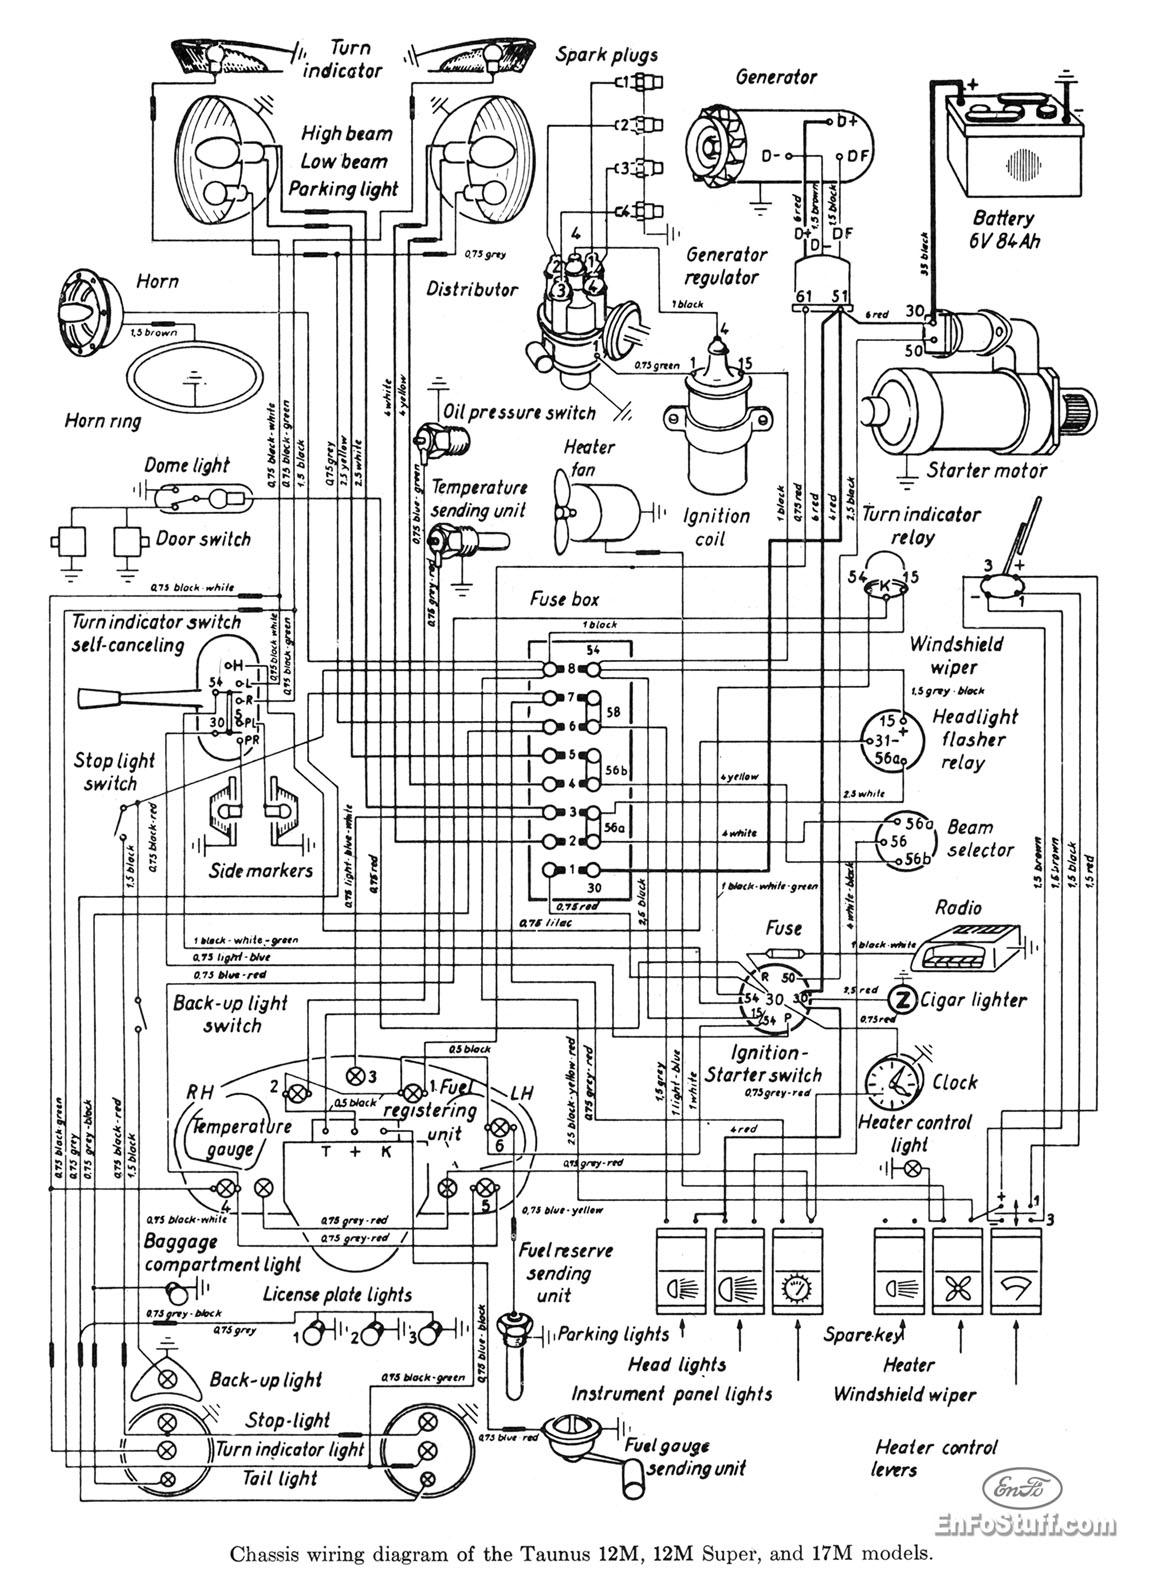 citroen c2 wiring diagram Files